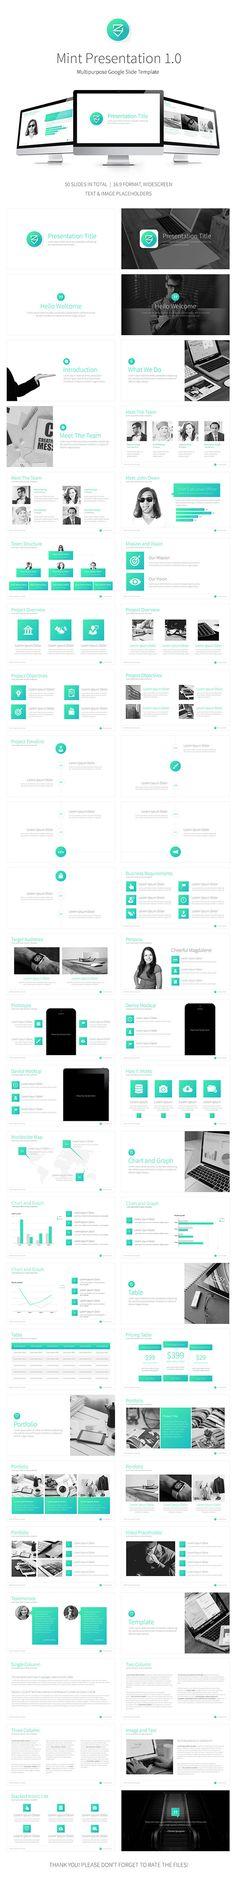 Mint Google Multipurpose Presentation Template - Google Slides Presentation Templates